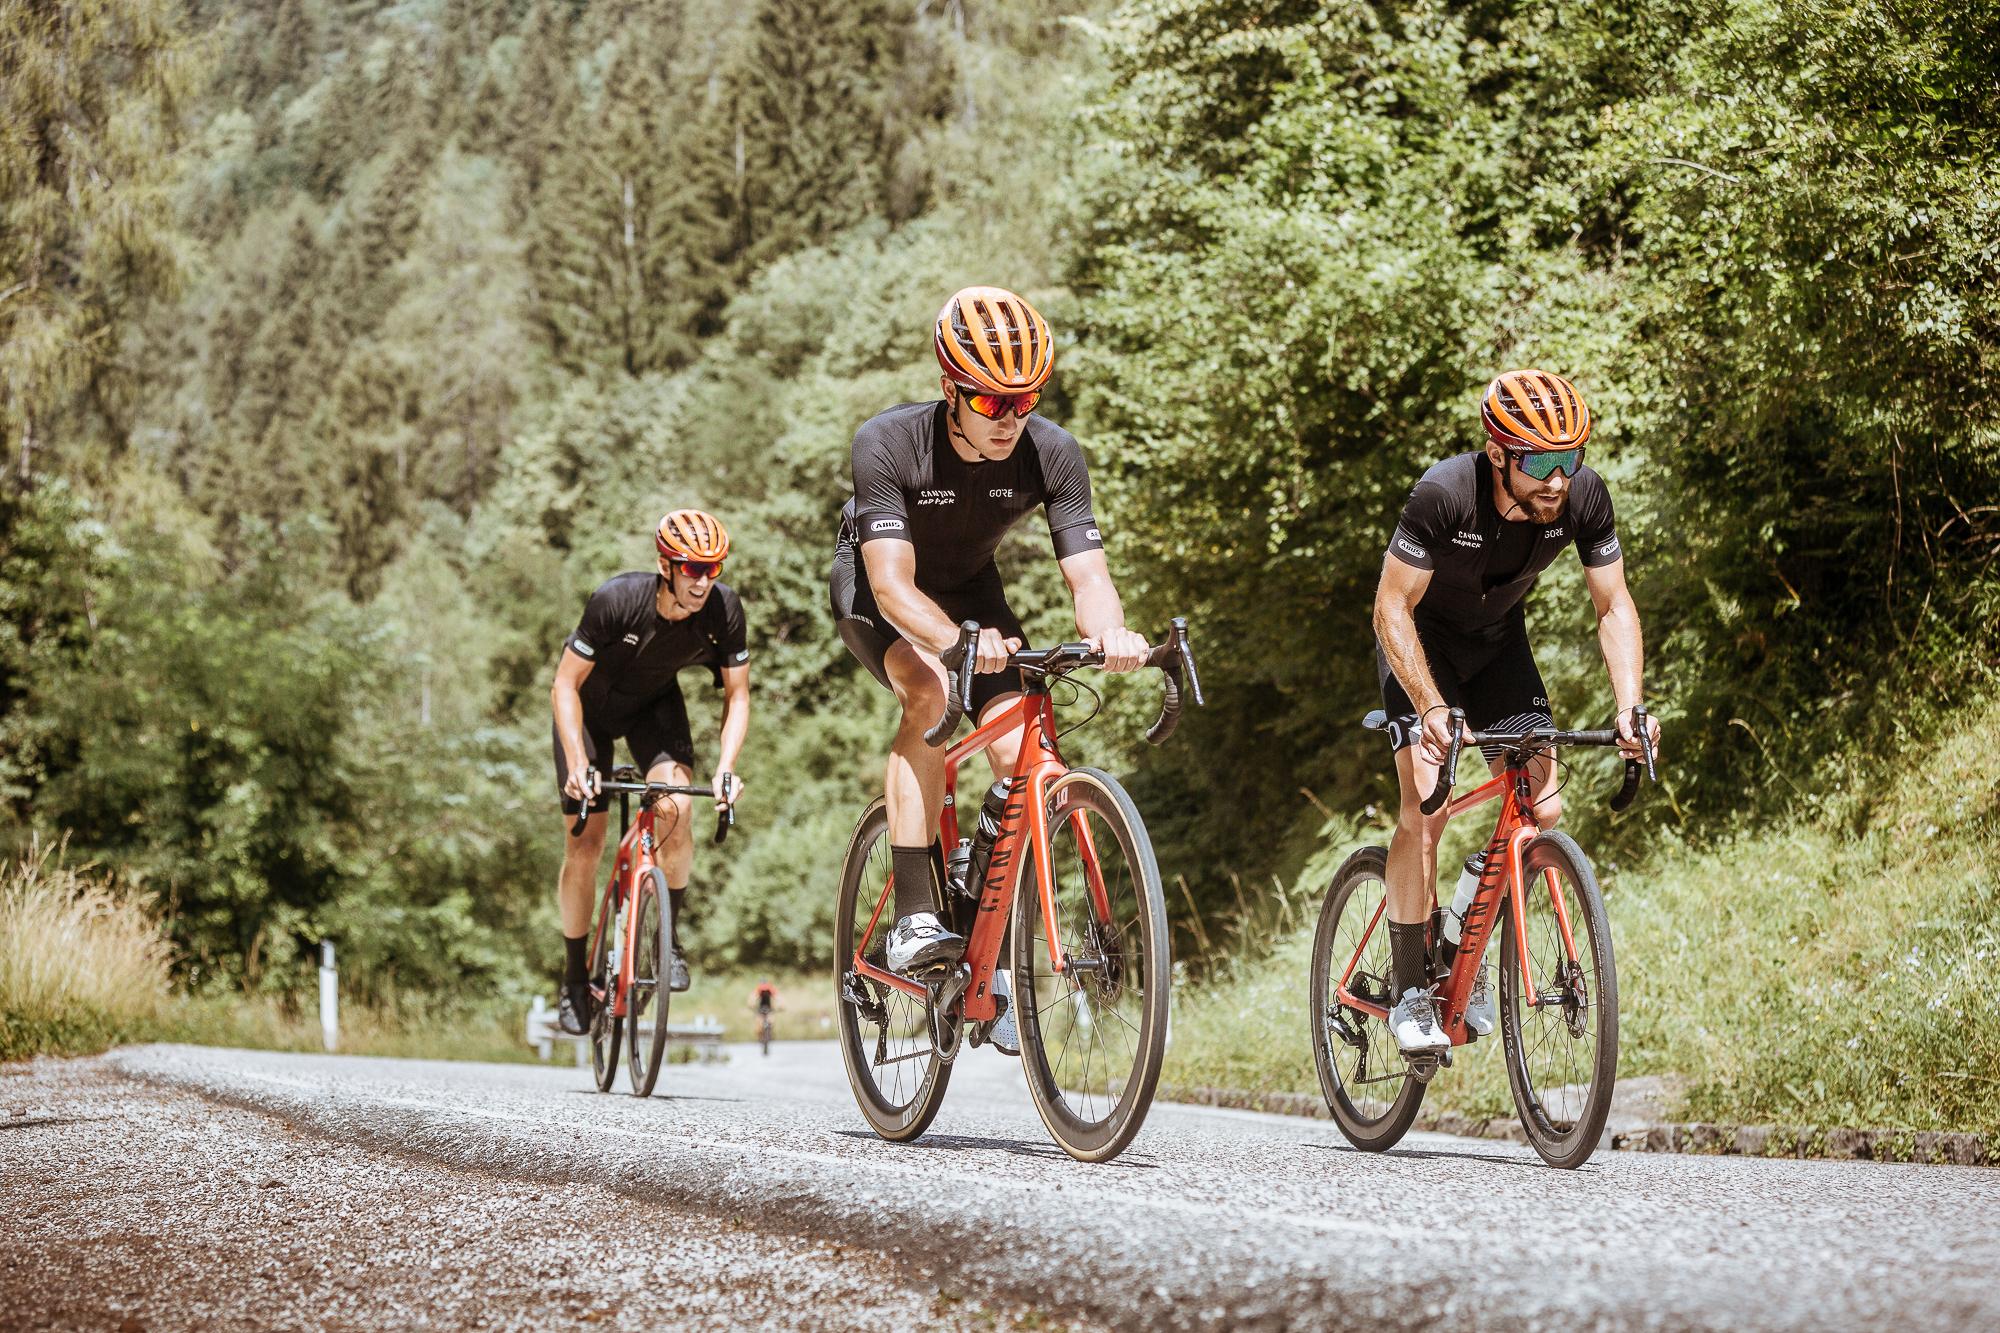 Steinweg-Christoph_Rad-Race_TdF-Testride-2018_A8A4517.jpg